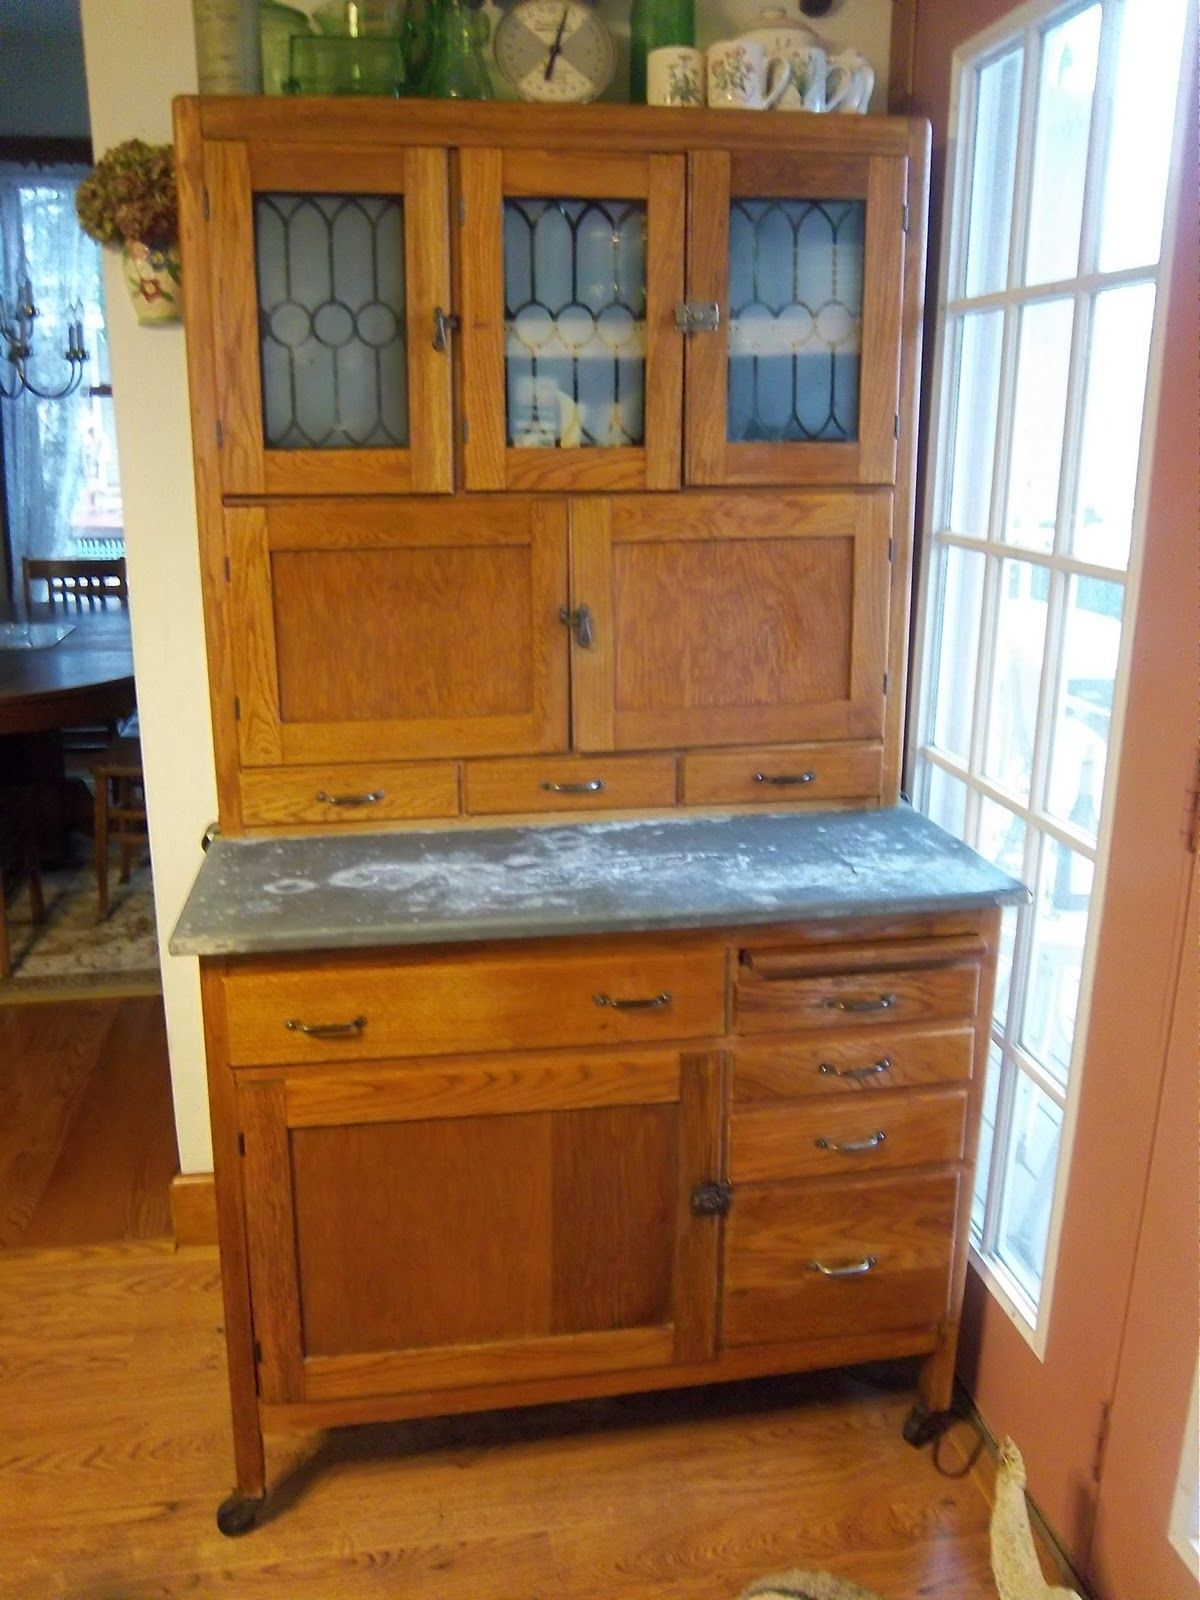 Antique Kitchen Cabinet with Flour Bin - A Sentimental Life: My Hoosier Cabinet Hoosier Cabinets